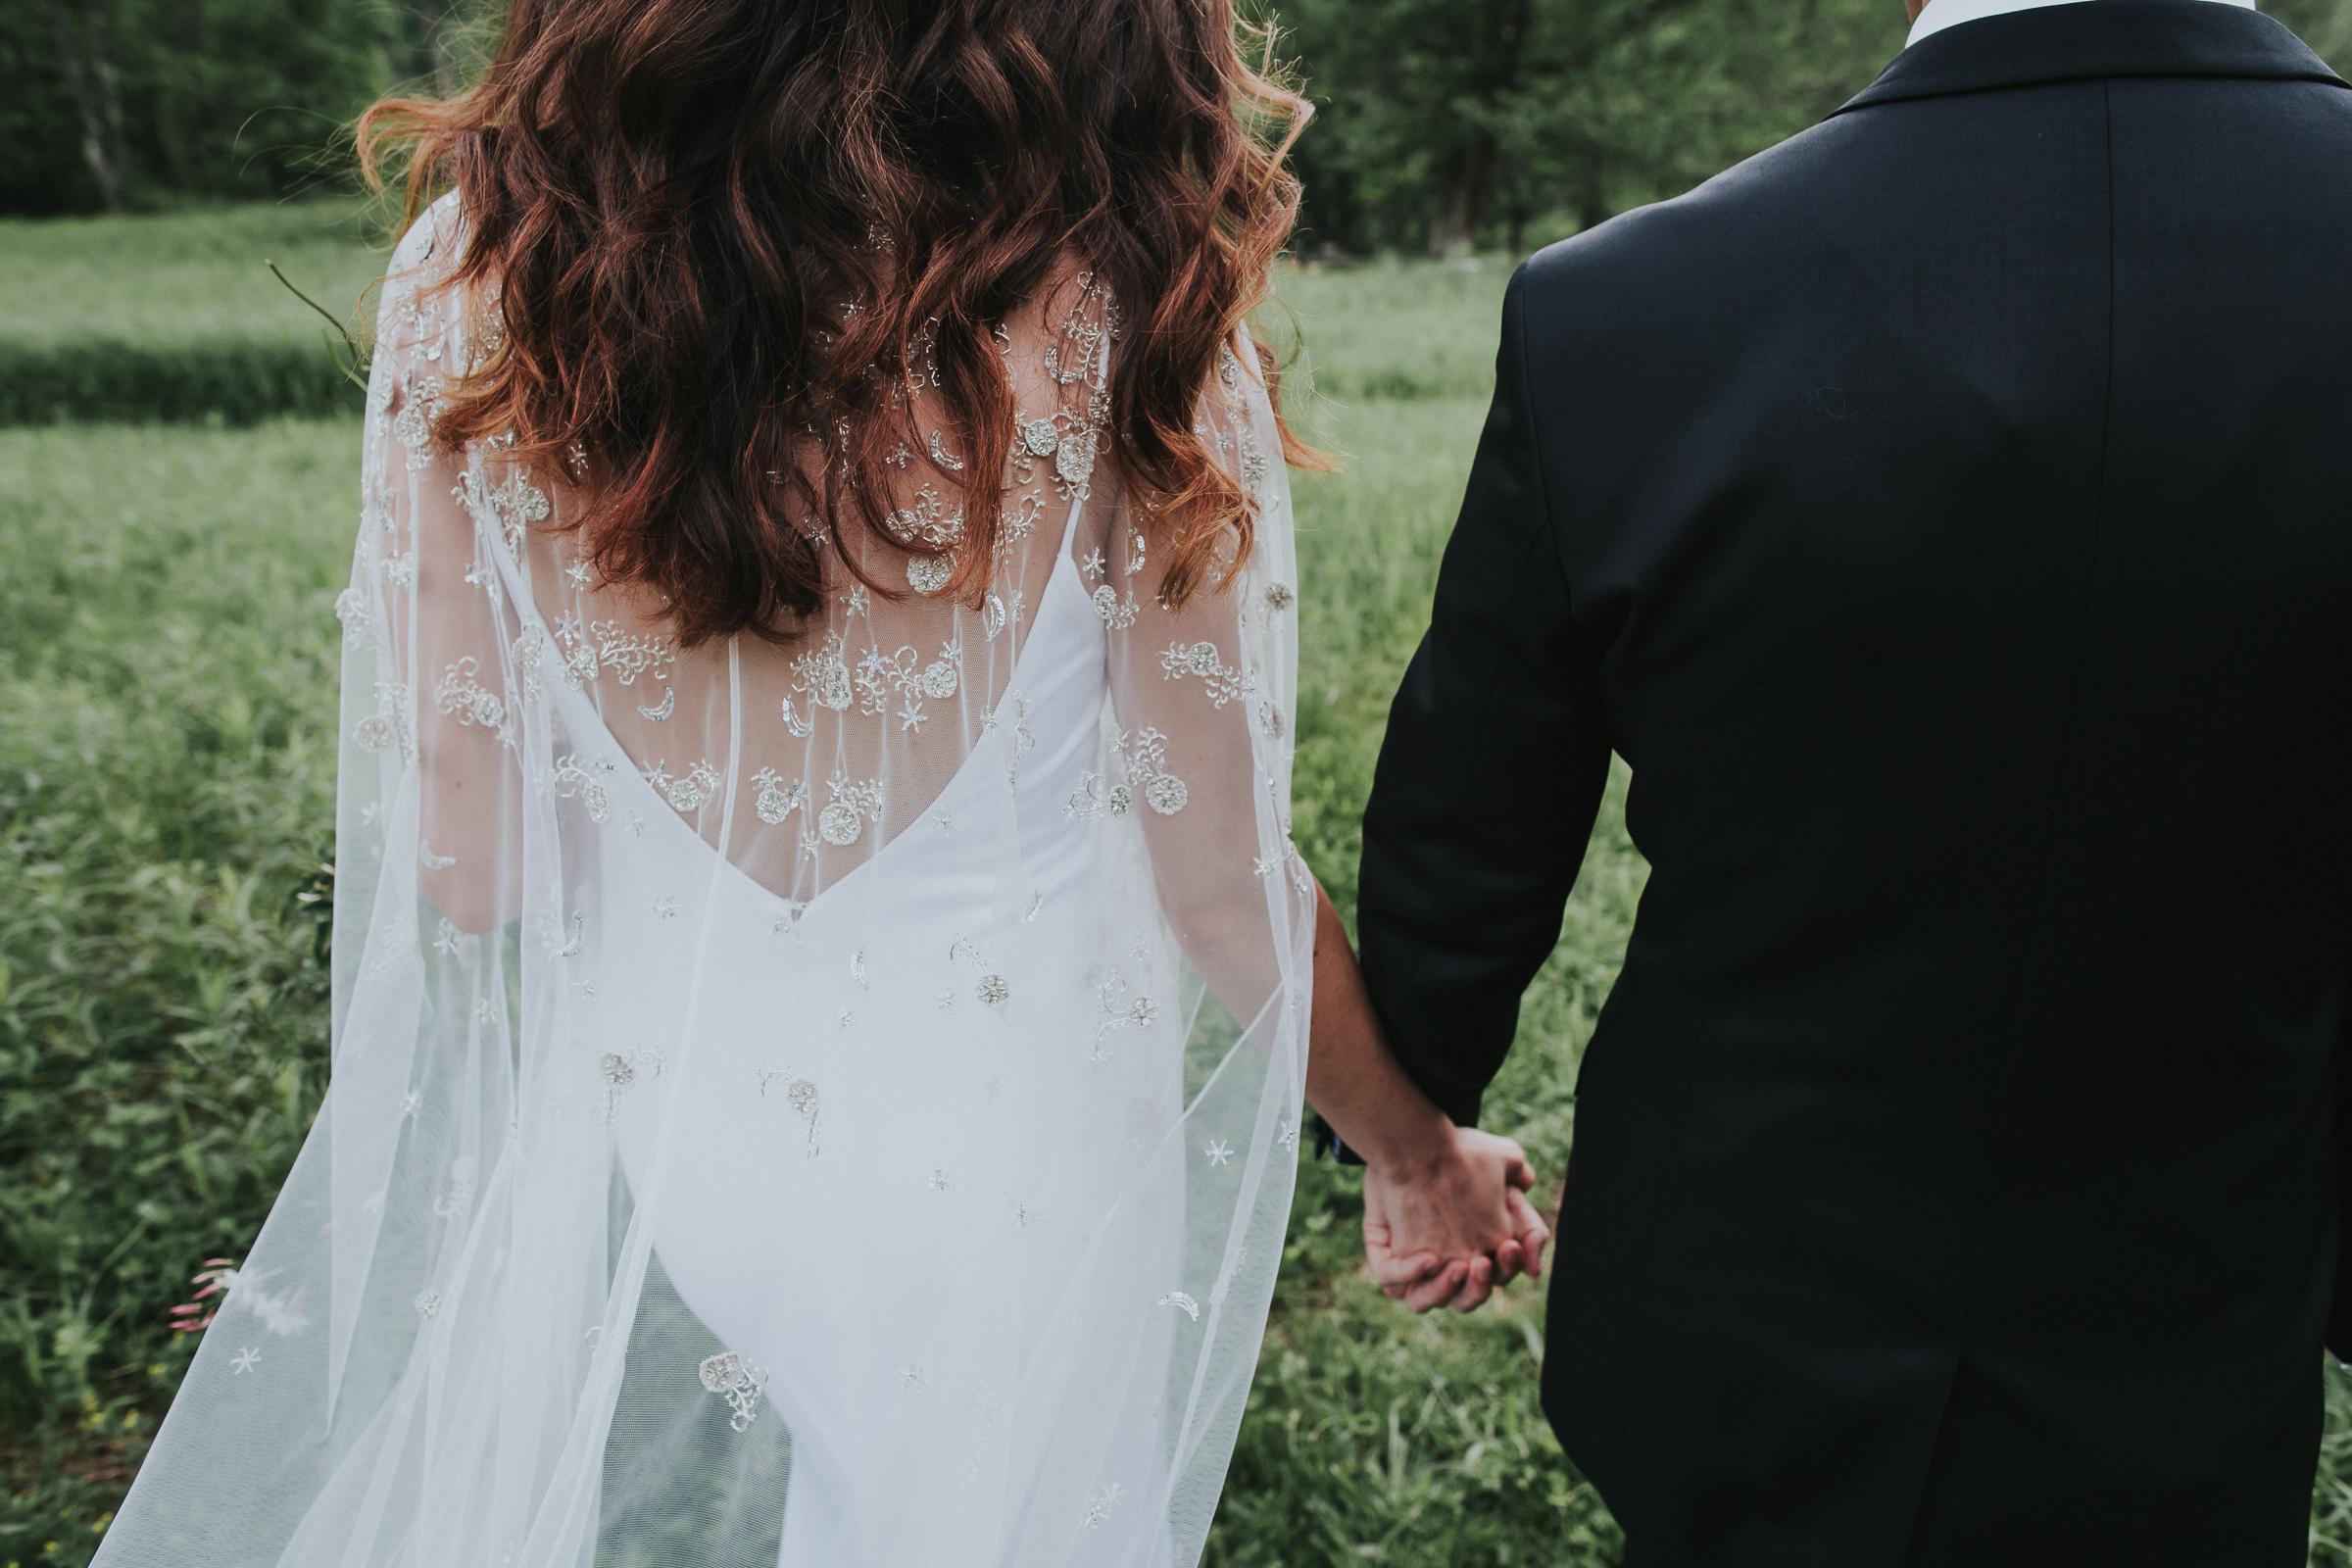 Handsome-Hollow-Long-Eddy-Catskills-New-York-Fine-Art-Documentary-Wedding-Photographer-37.jpg